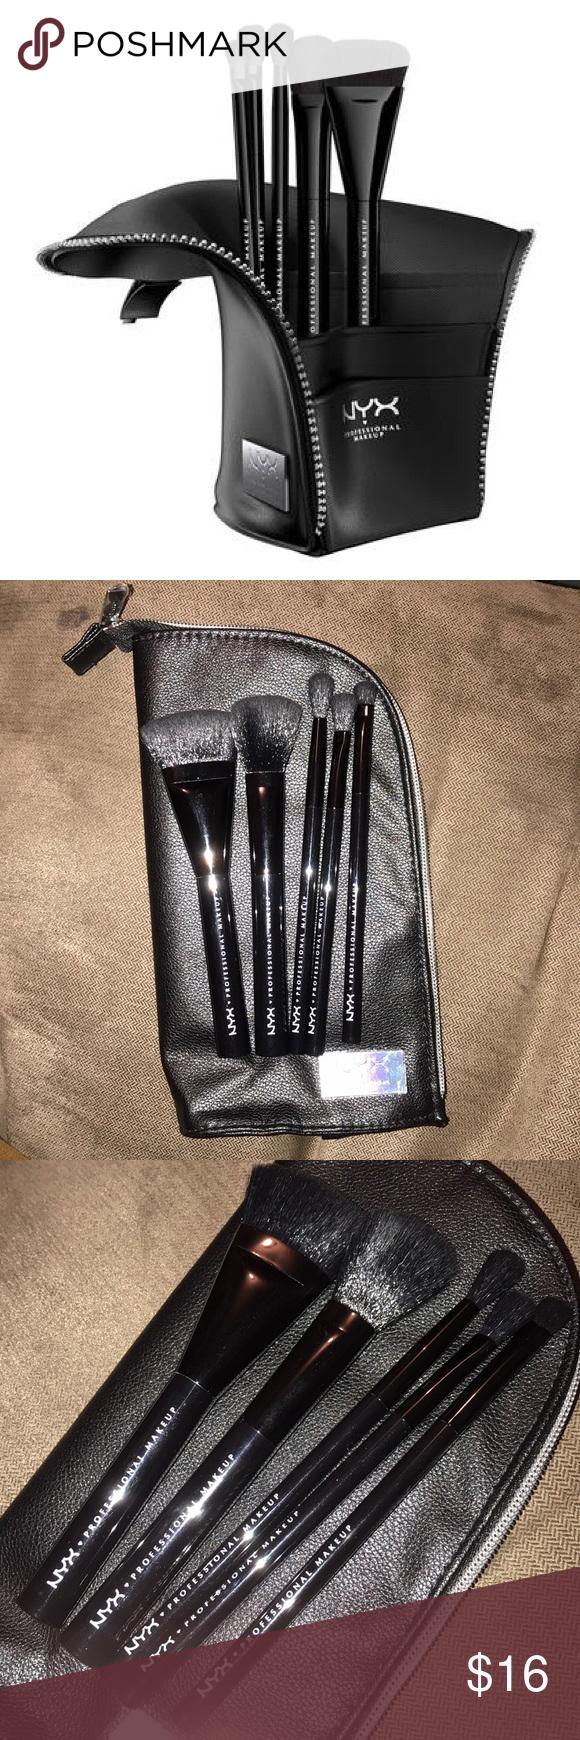 NYX Beauty Staple Brush Set (5) Brand new set of brushes